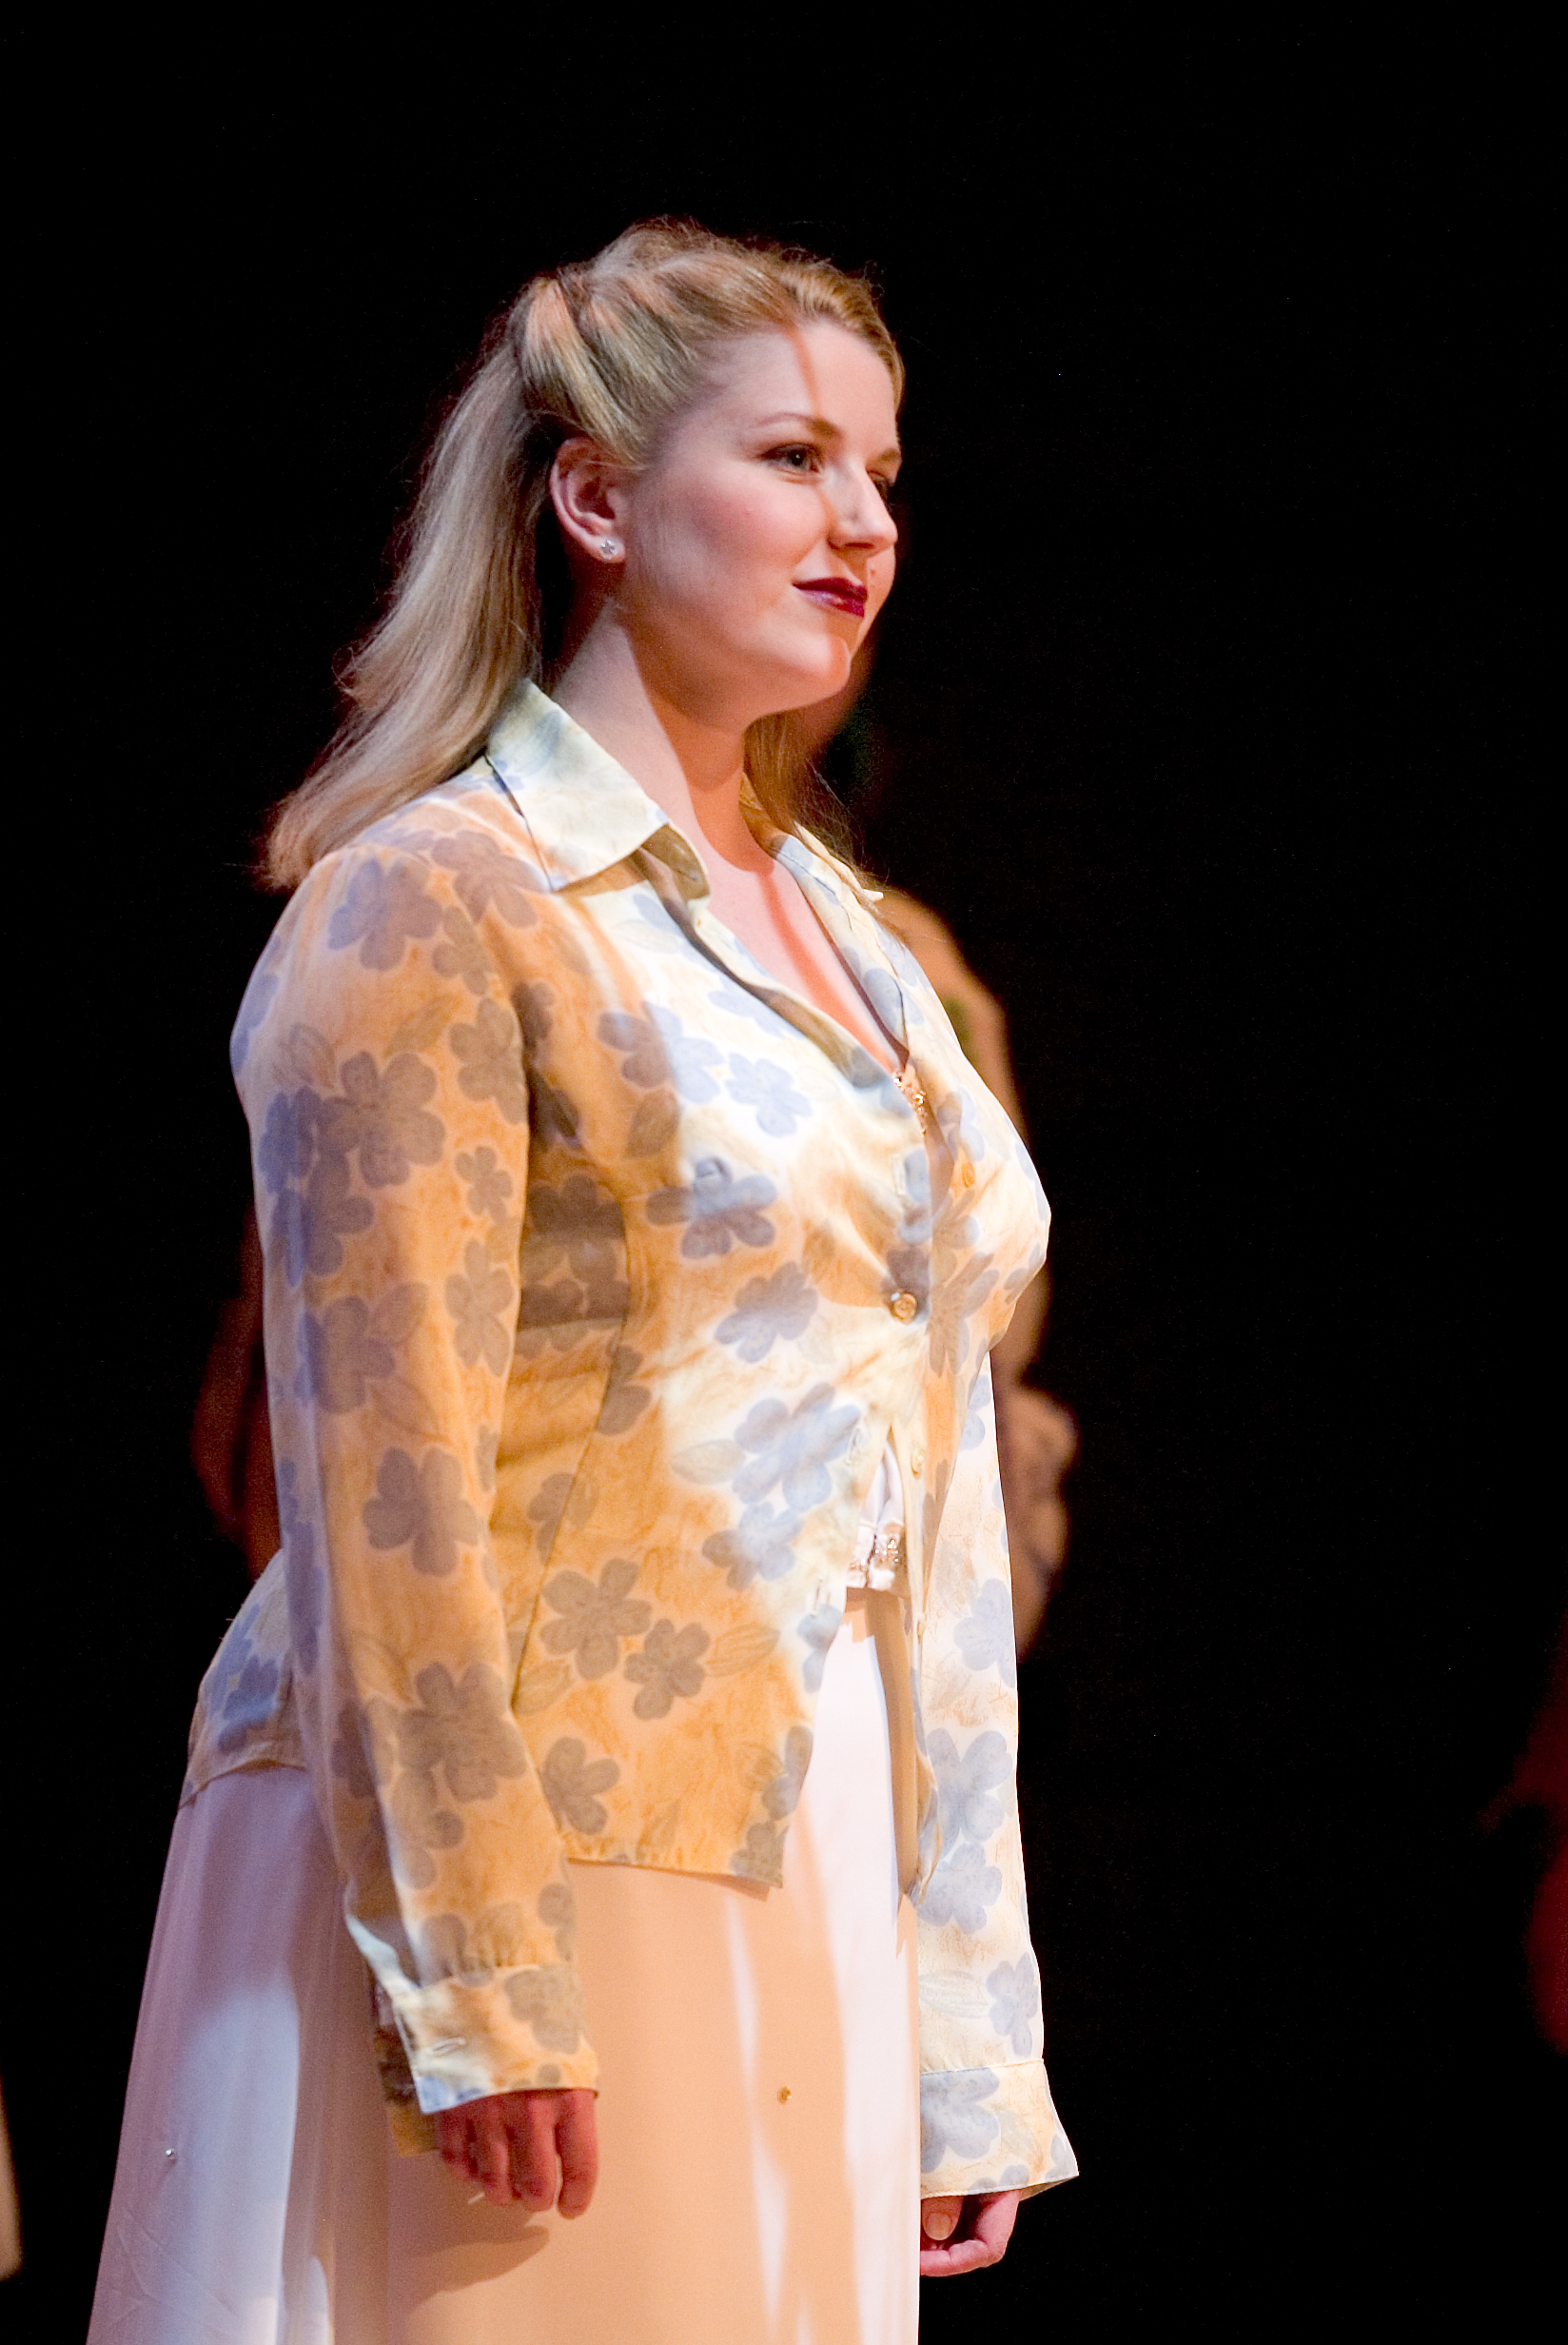 Penelope Mills